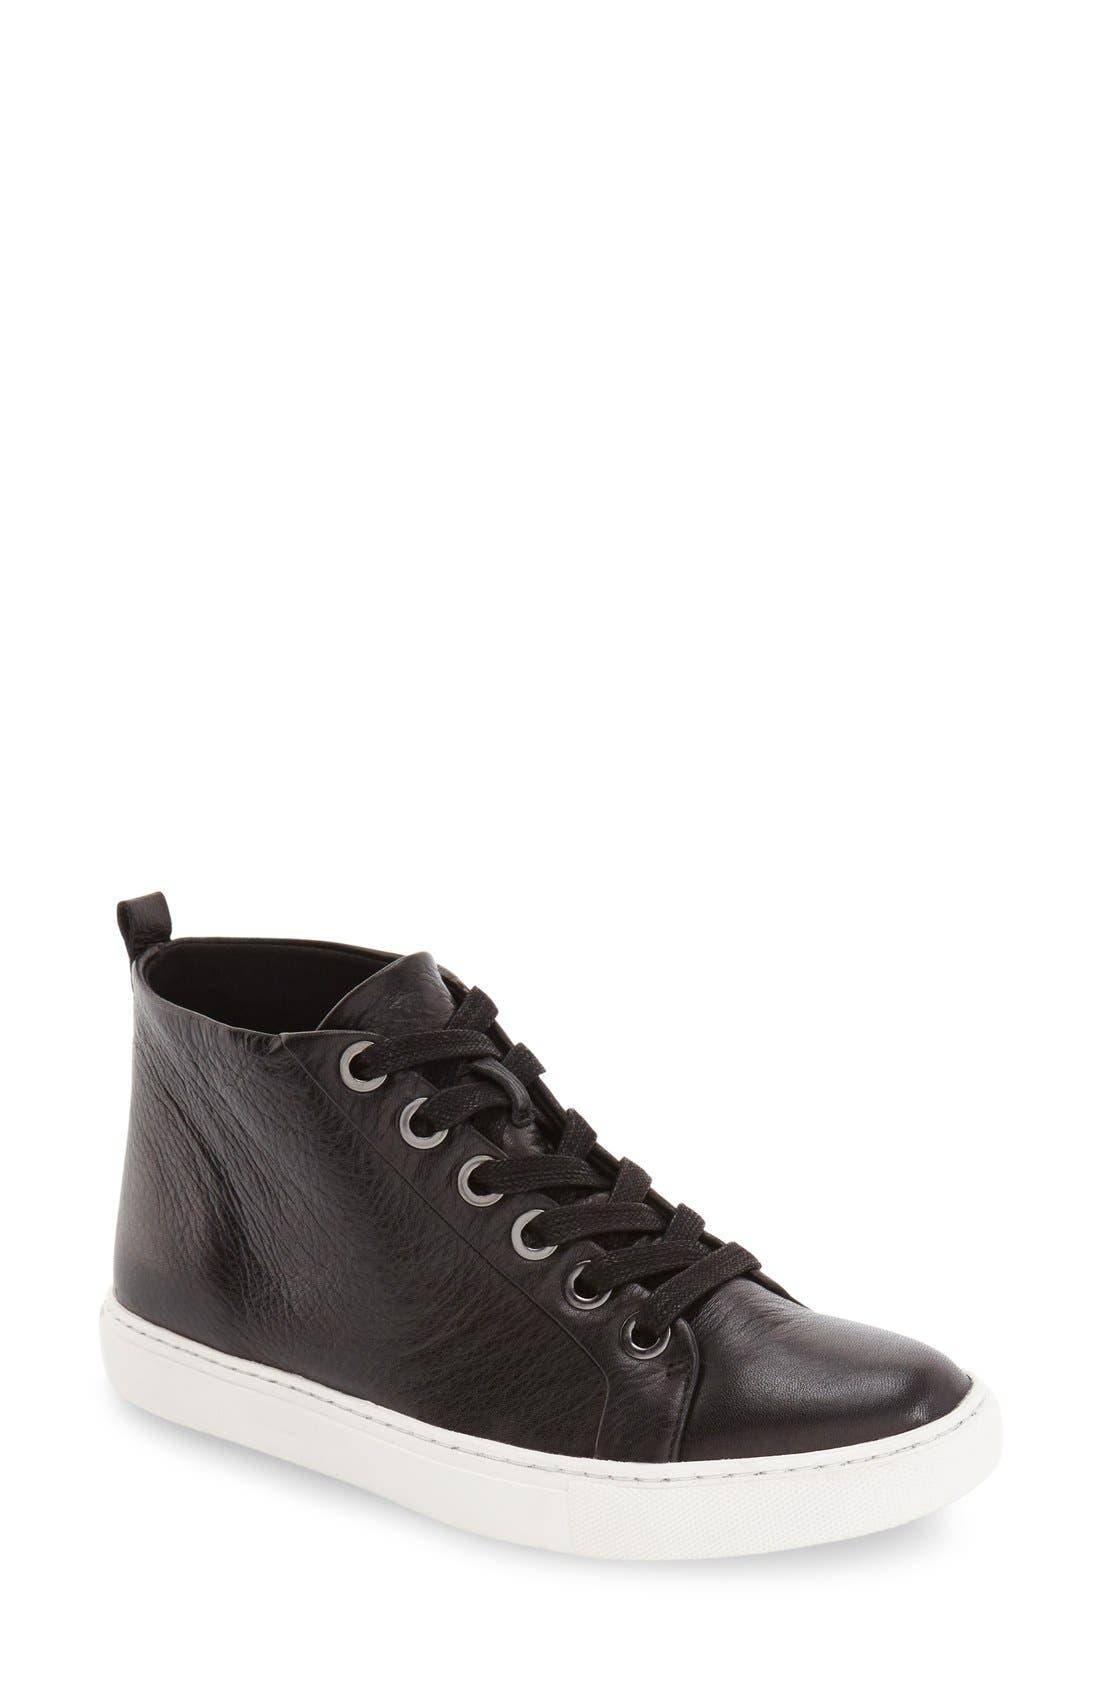 'Kaleb' High Top Sneaker,                             Main thumbnail 1, color,